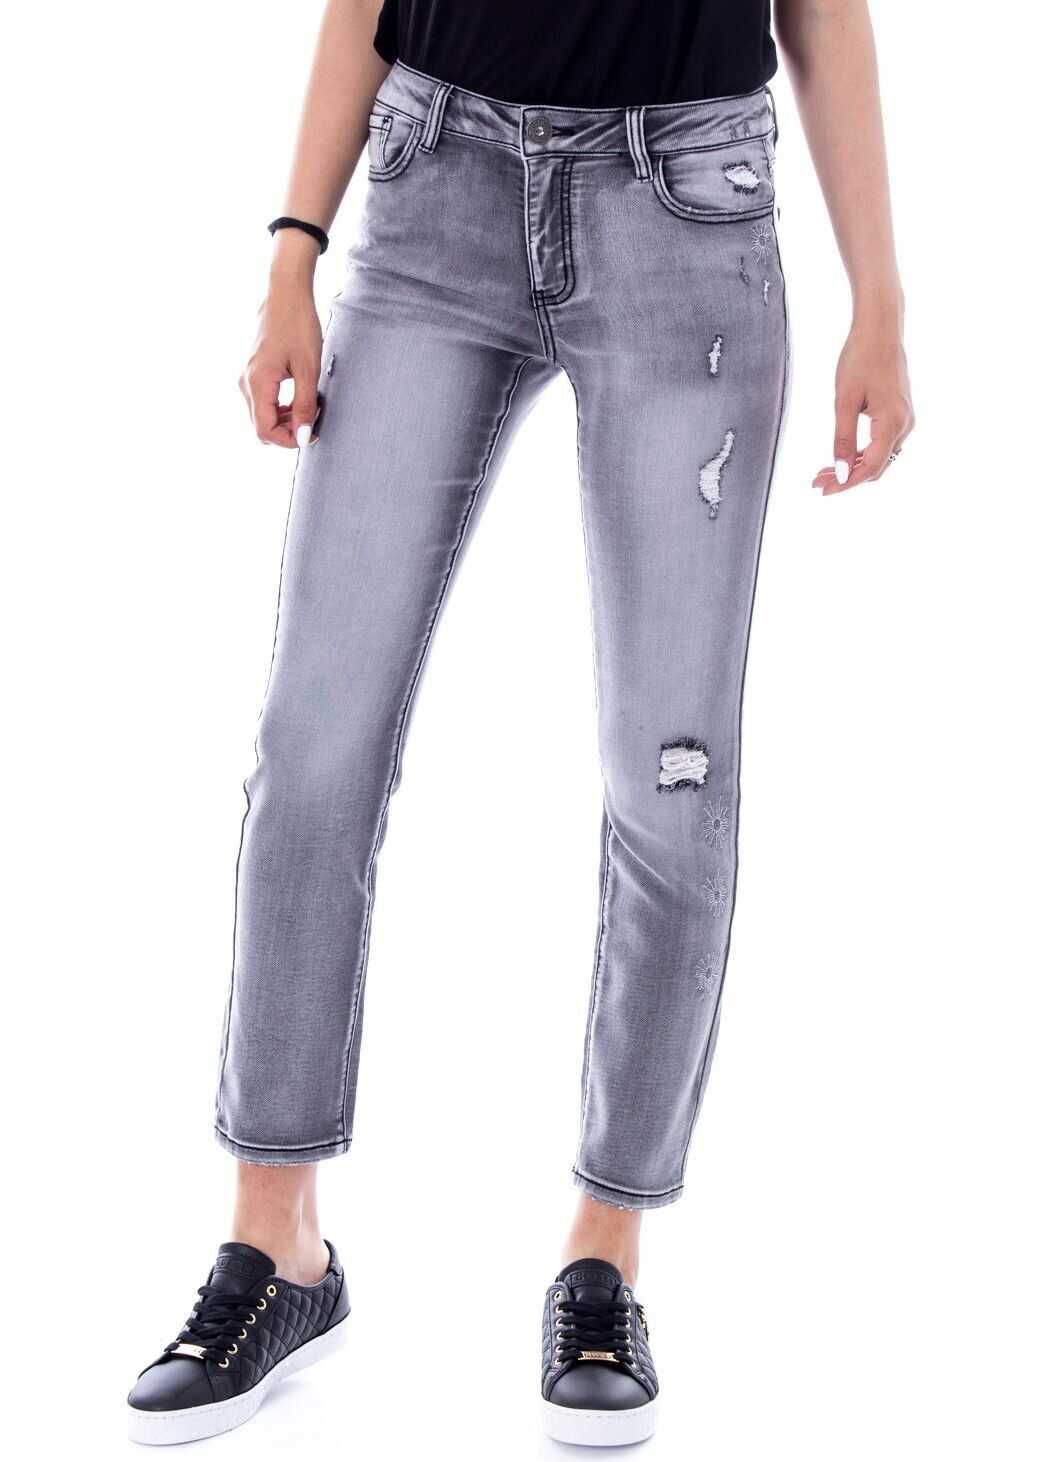 Desigual Cotton Jeans GREY